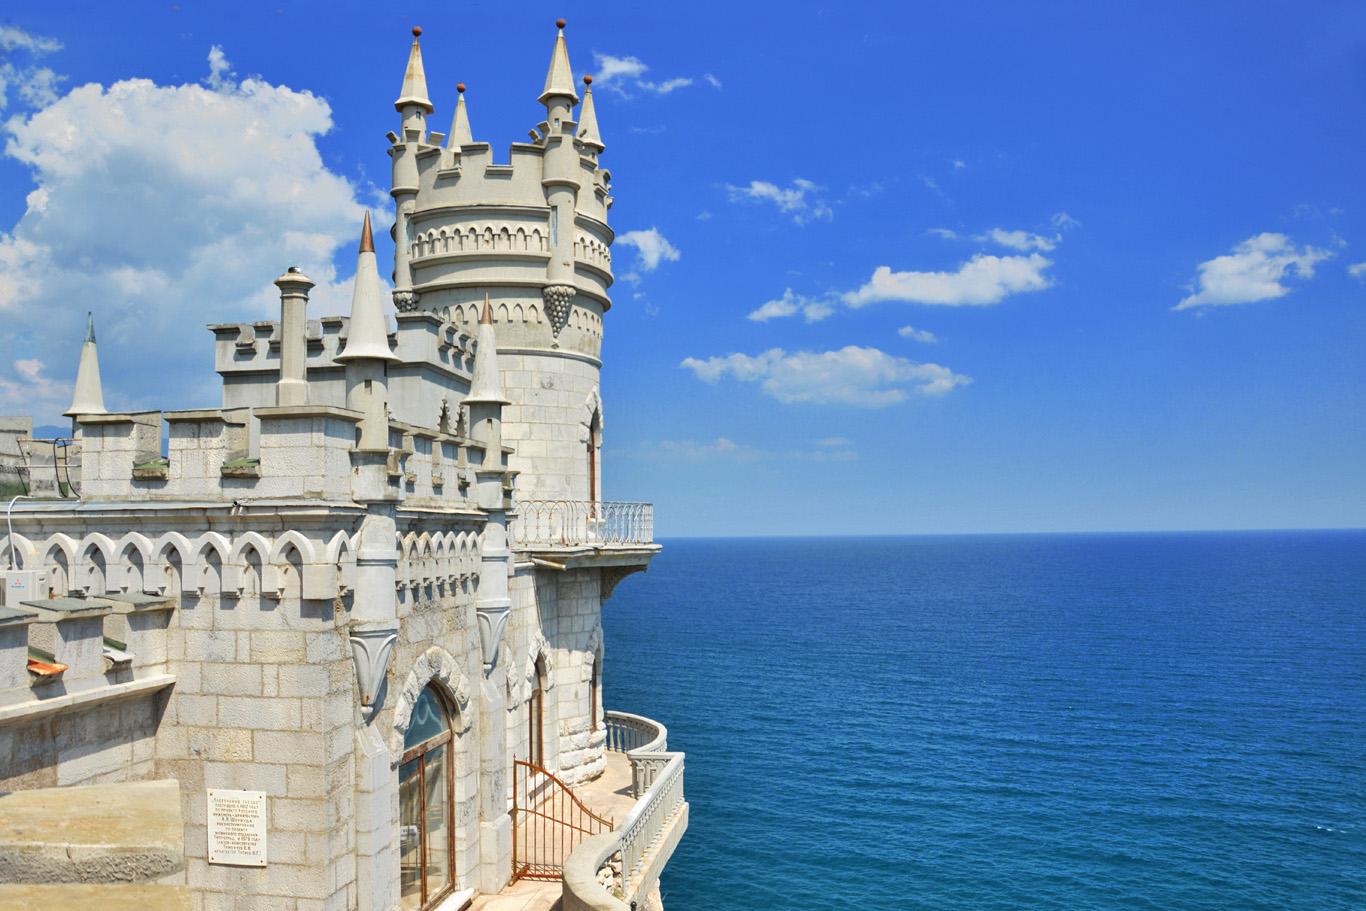 Yalta and The Fairytale Swallow's Nest Castle - Crimea, Ukraine